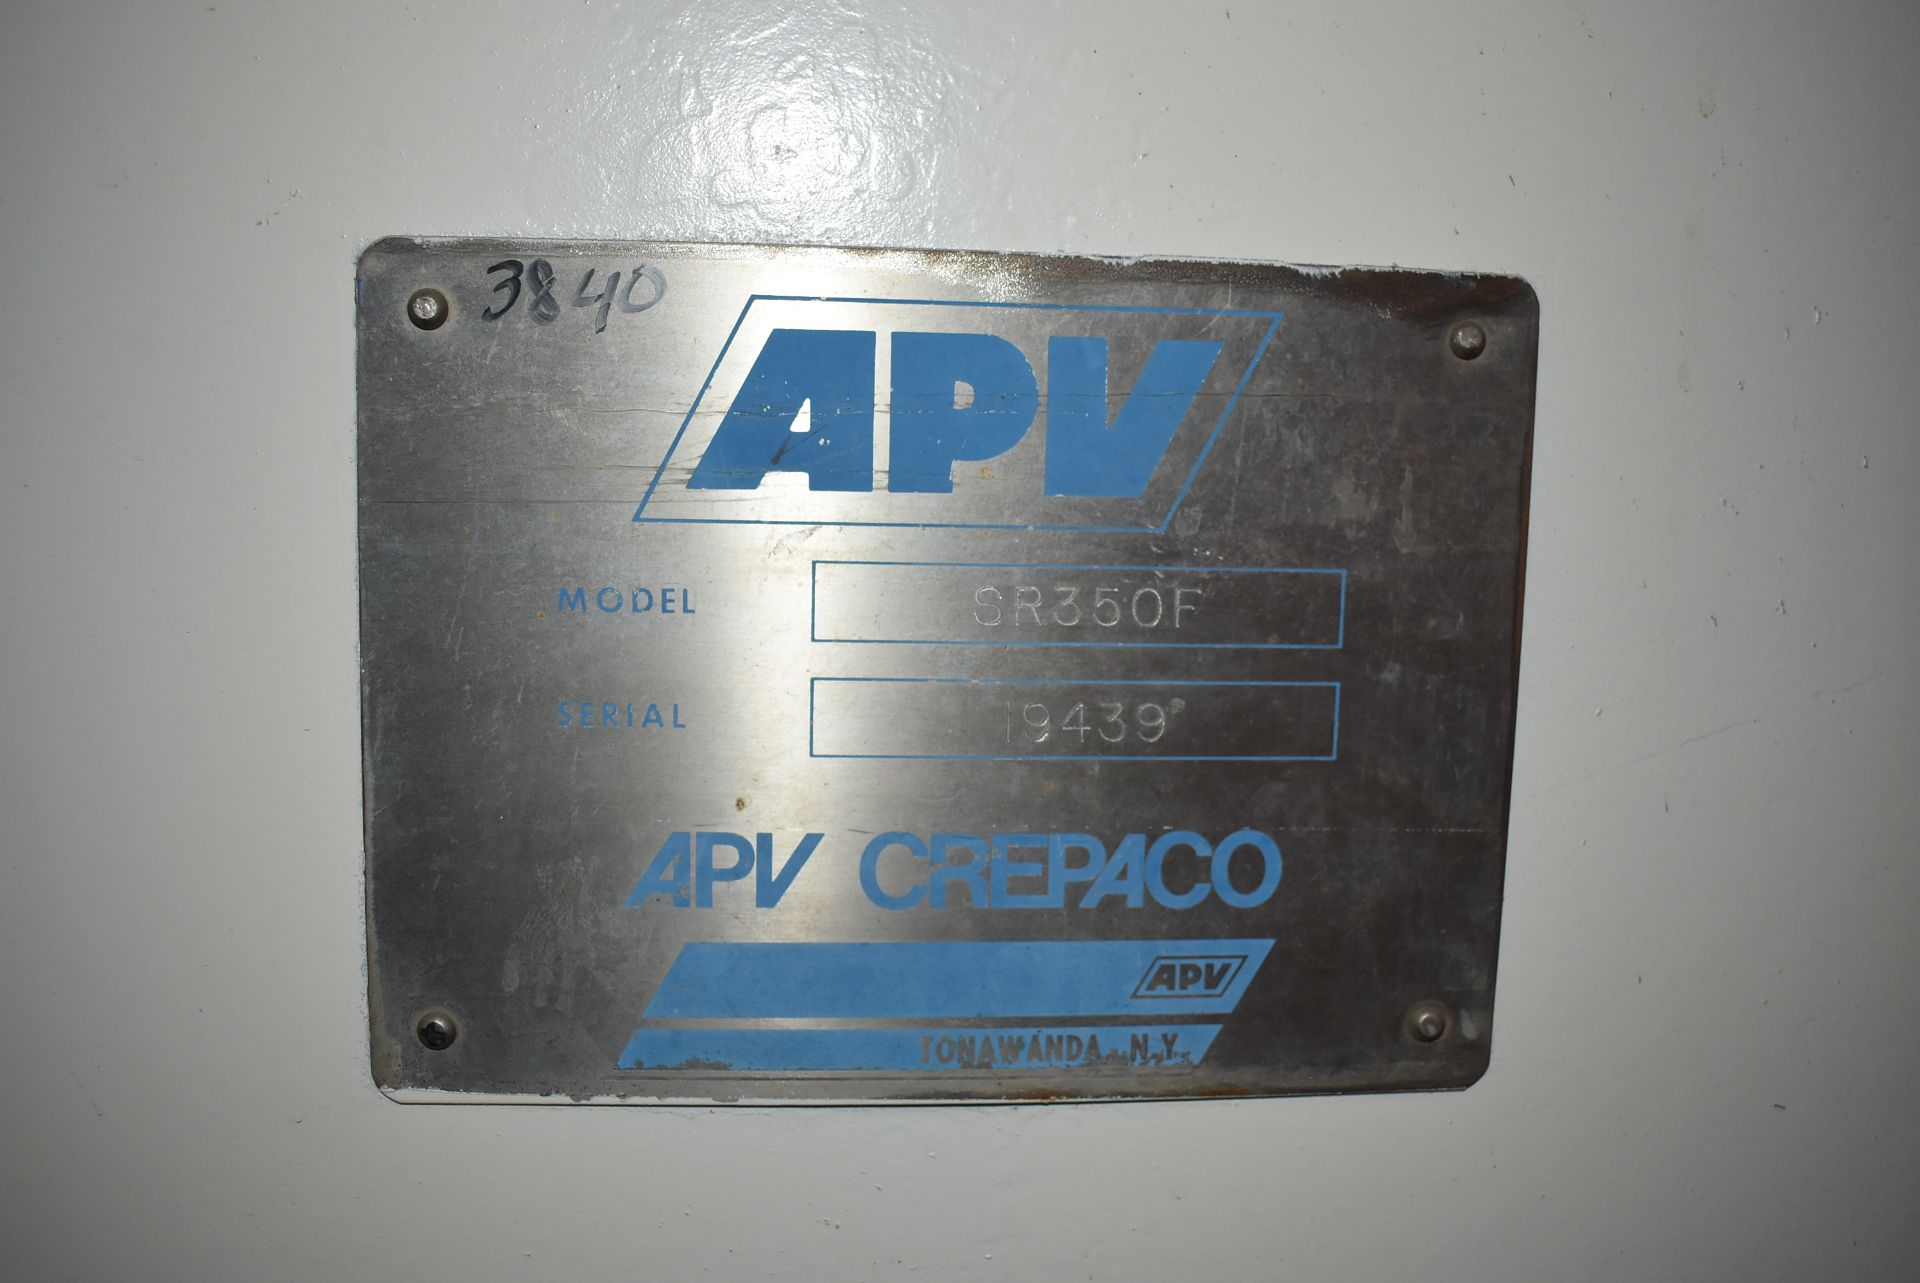 APV/Crepaco Model #SR350F Heat Exchanger, SN 19439 - Image 2 of 3